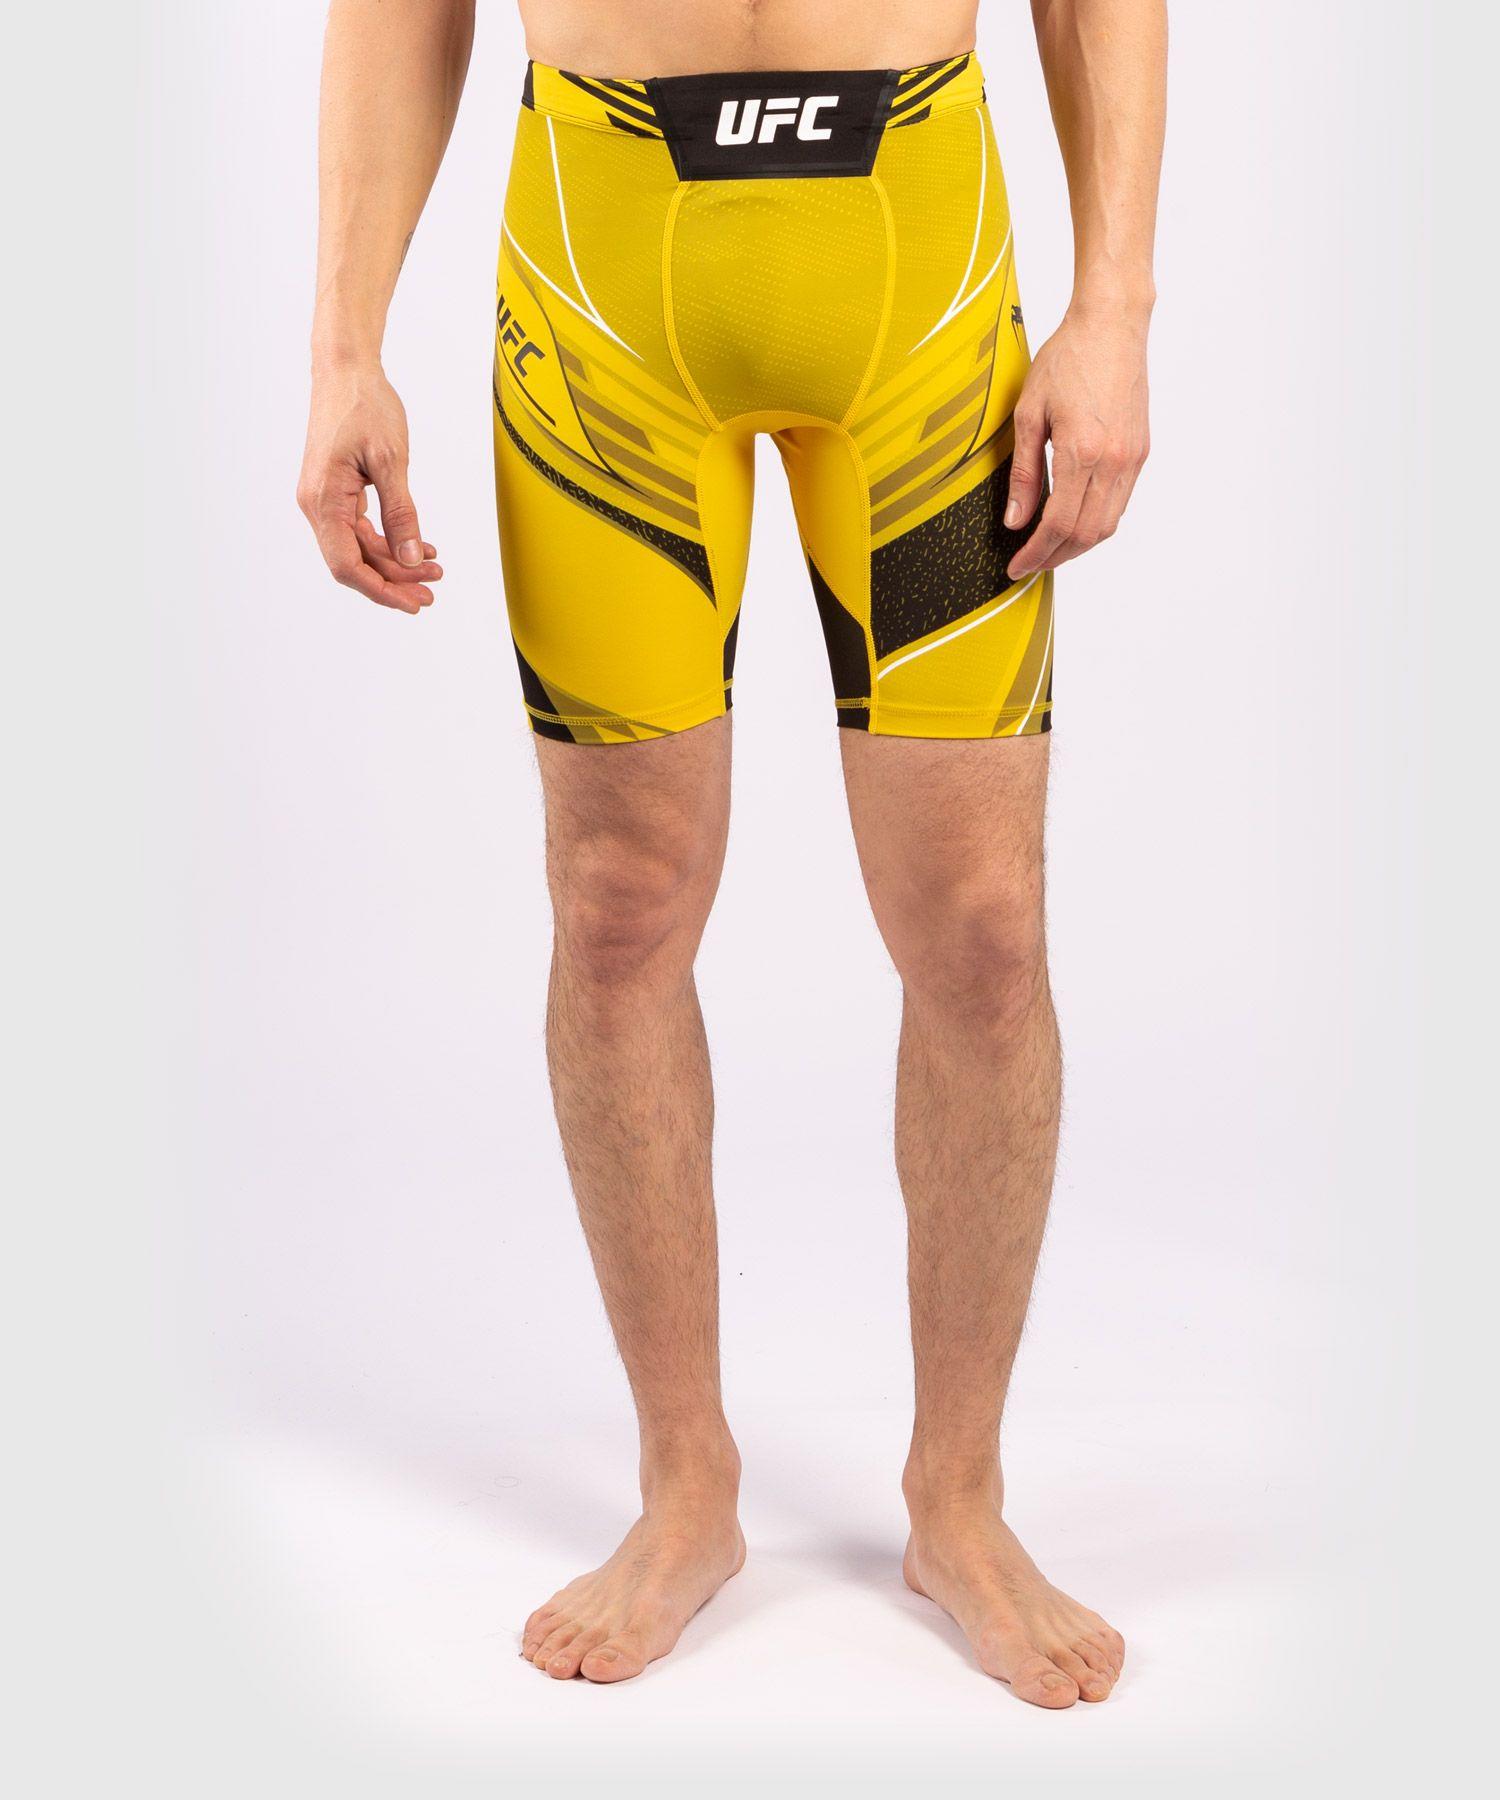 UFC Venum Authentic Fight Night Men's Vale Tudo Shorts - Long Fit - Yellow